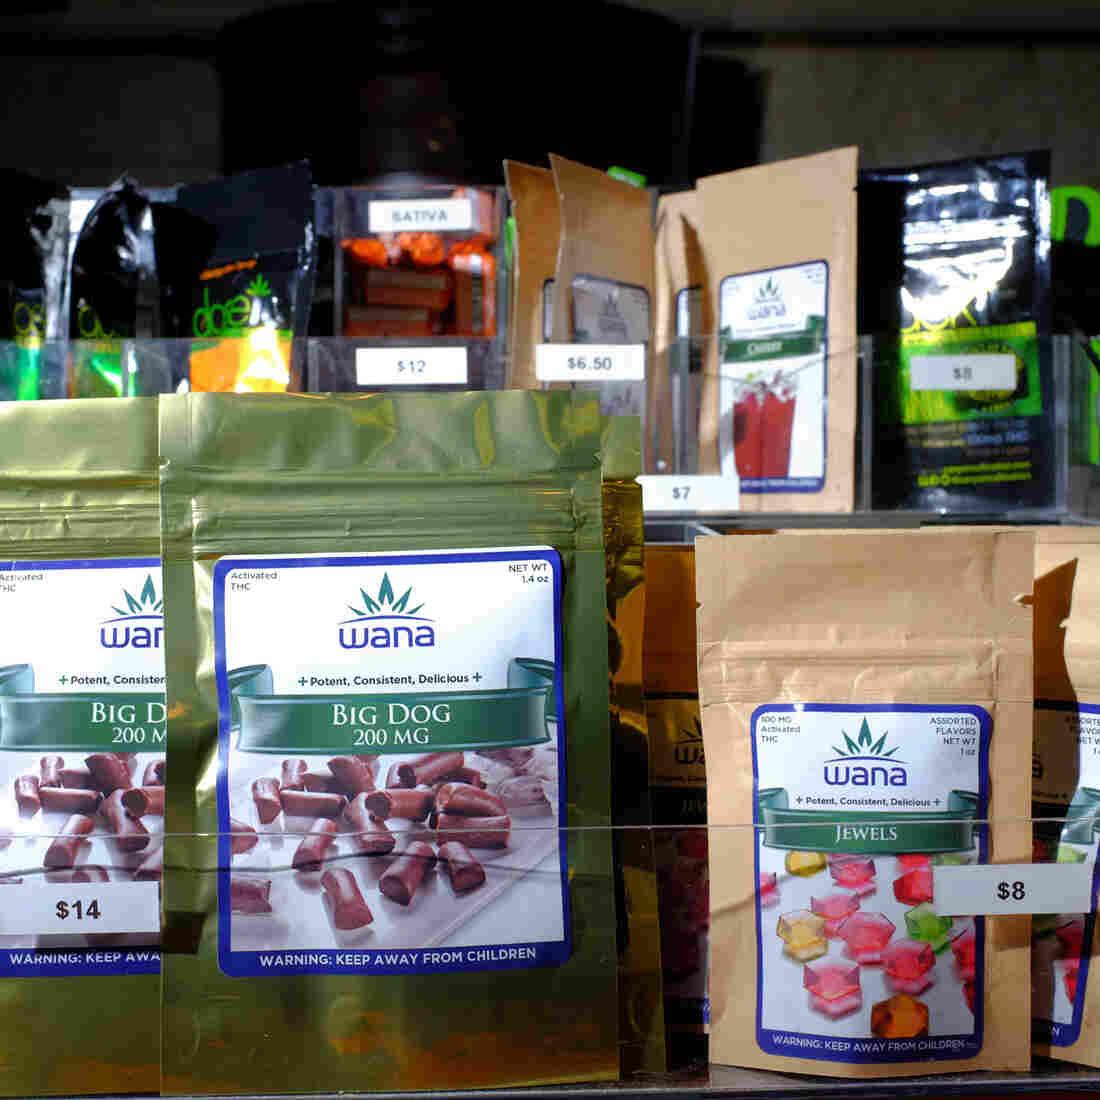 Edibles available at LoDo Wellness Center, a retail marijuana and medical marijuana dispensary and grow facility in downtown Denver.